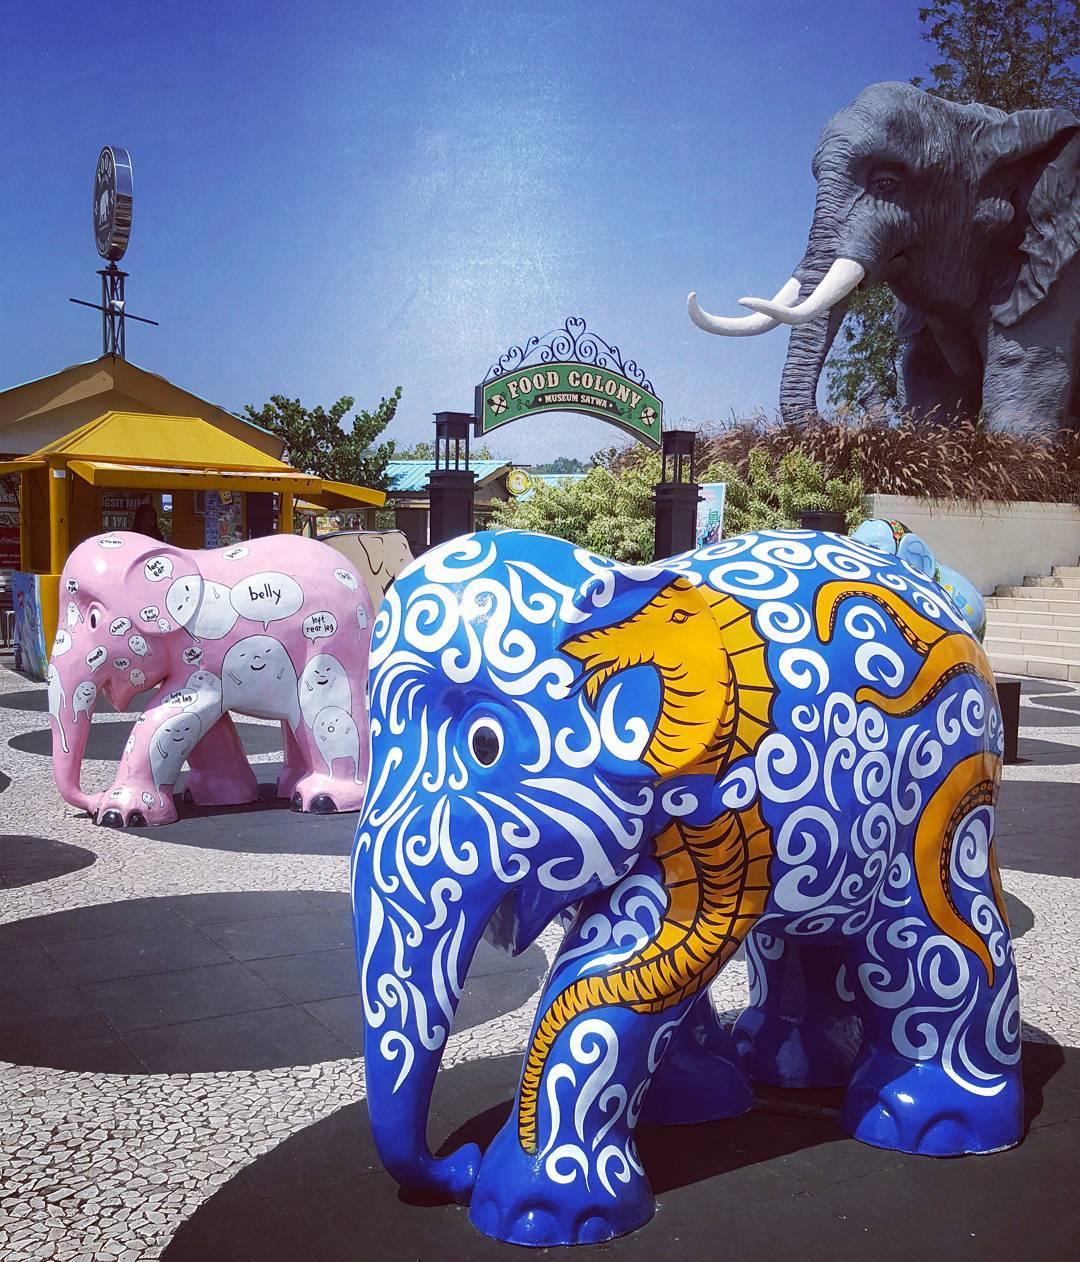 Jawa Timuar Park 2, Malang Raya, Dolan Dolen, Dolaners Jawa Timuar Park via deasypuri - Dolan Dolen